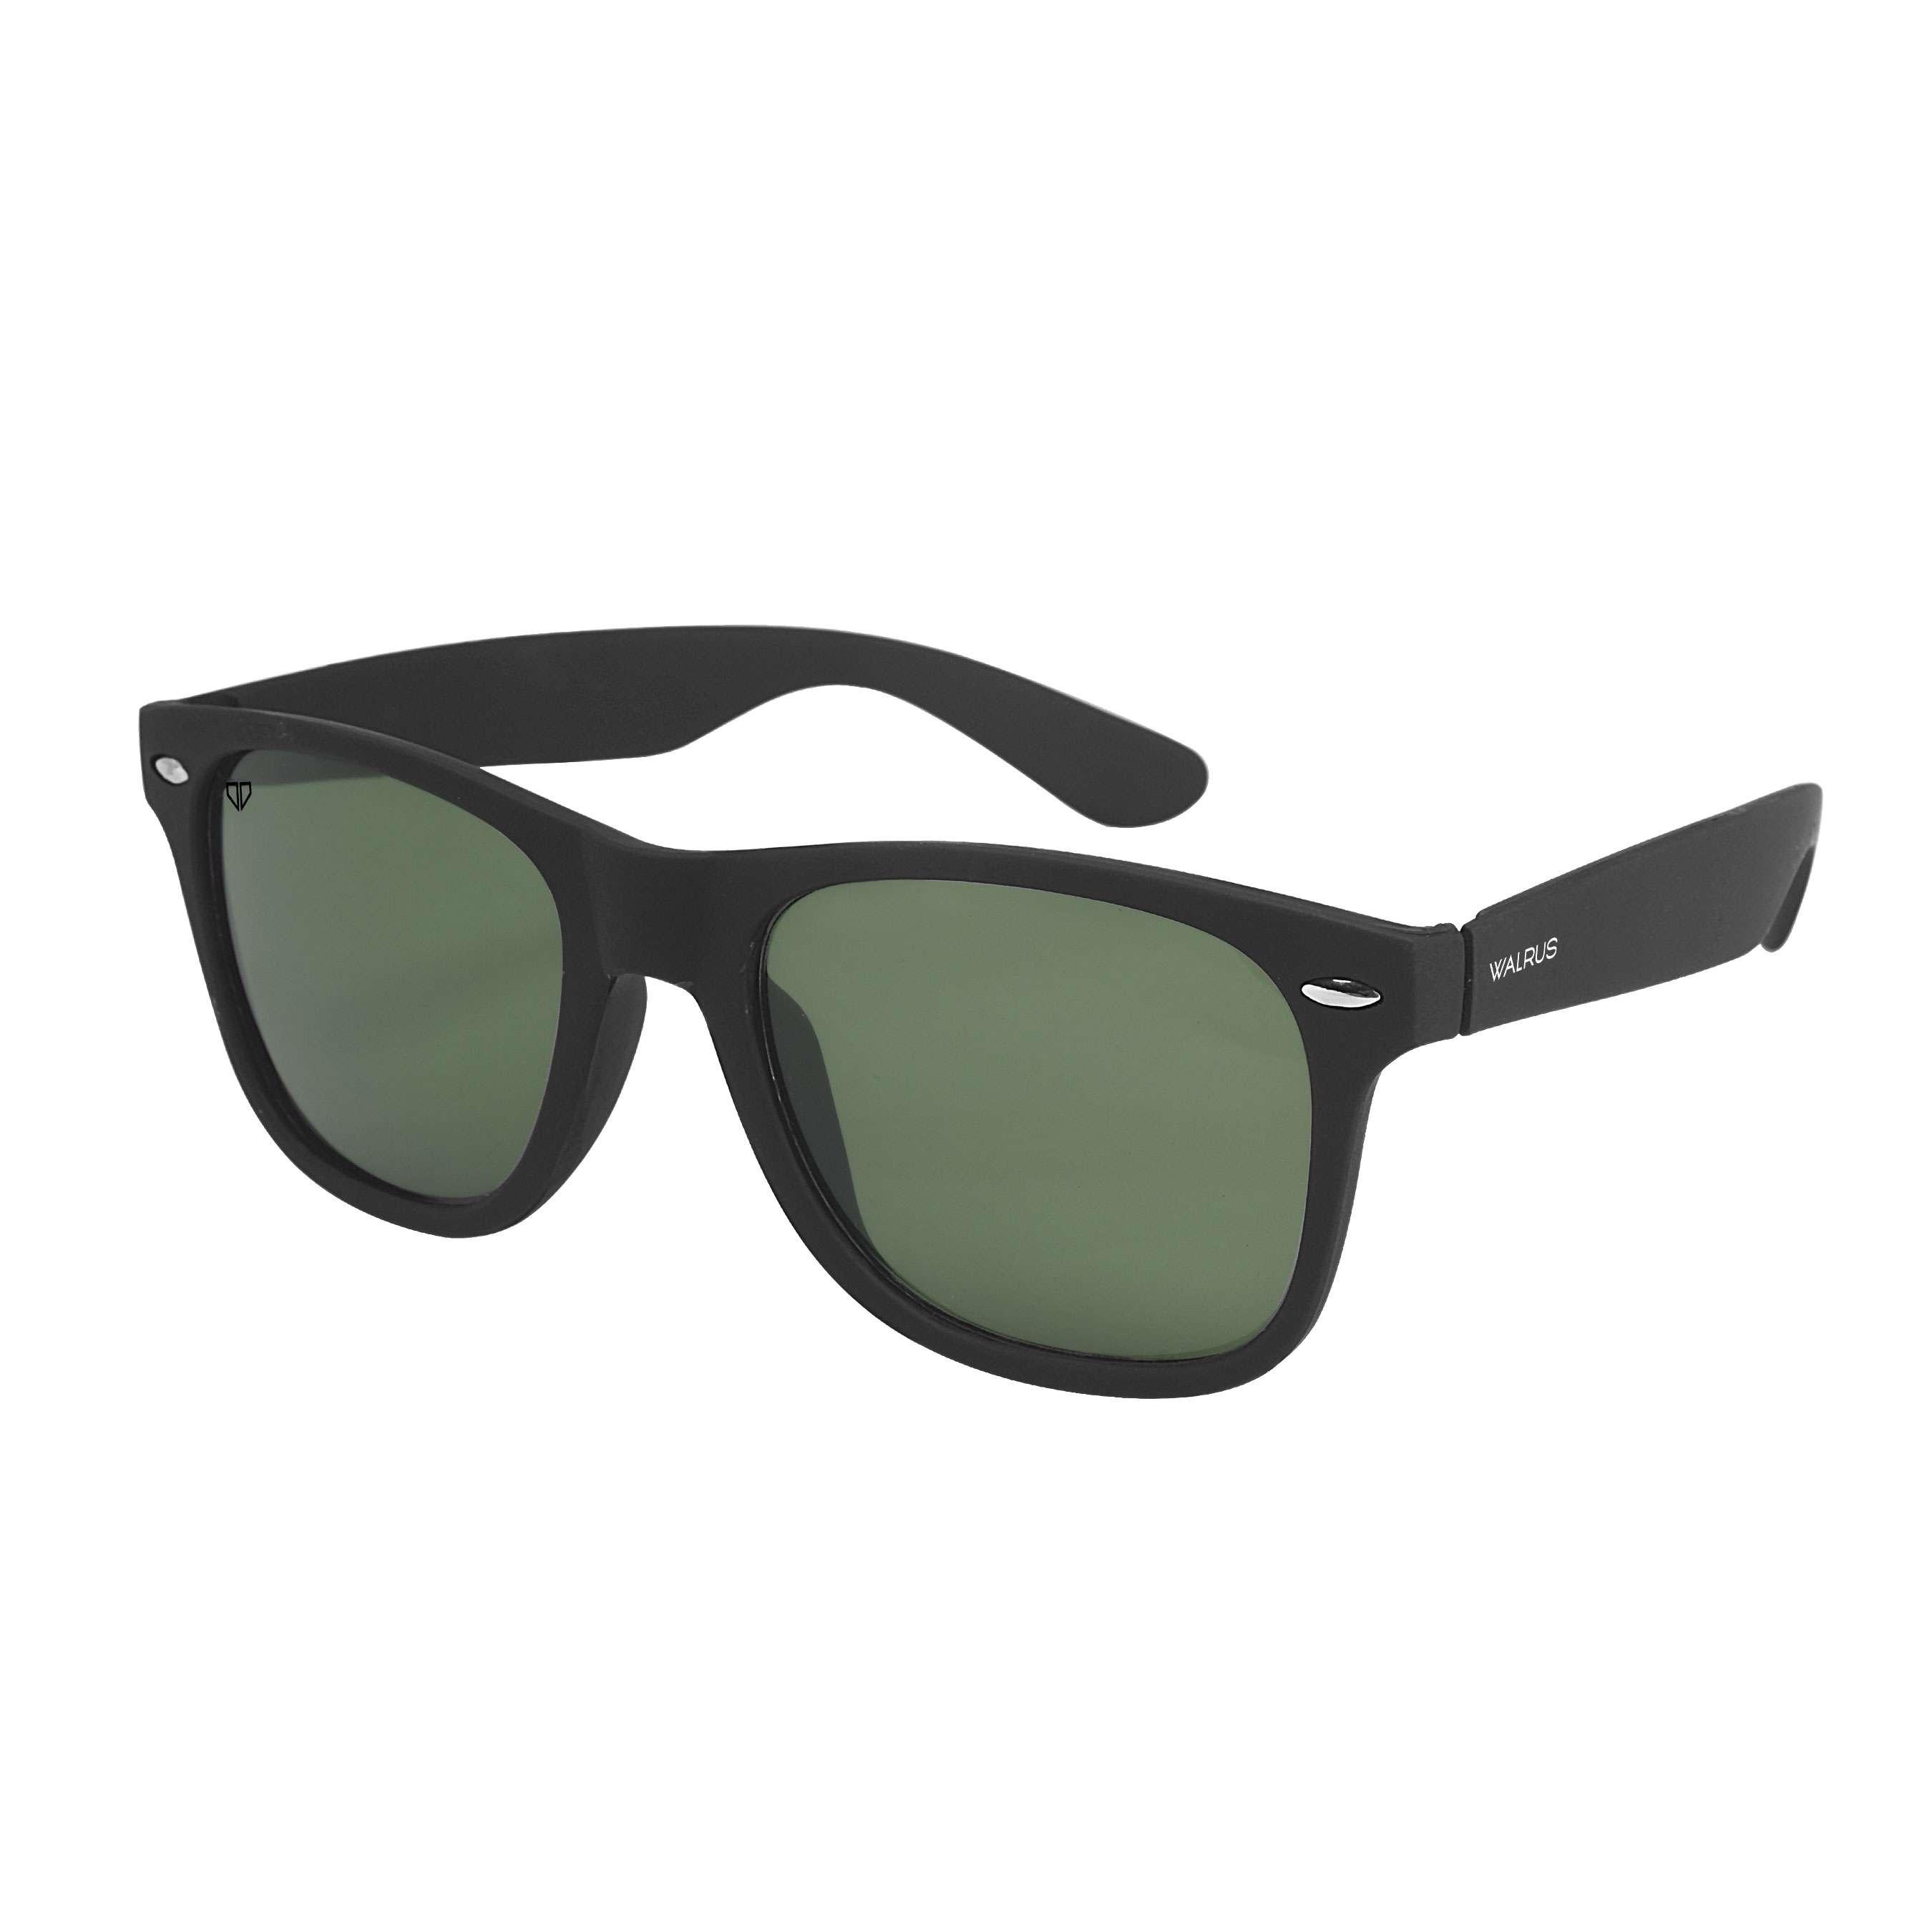 Walrus Urbane Black Color Unisex Wayfarer Sunglass- WS-URB-020202